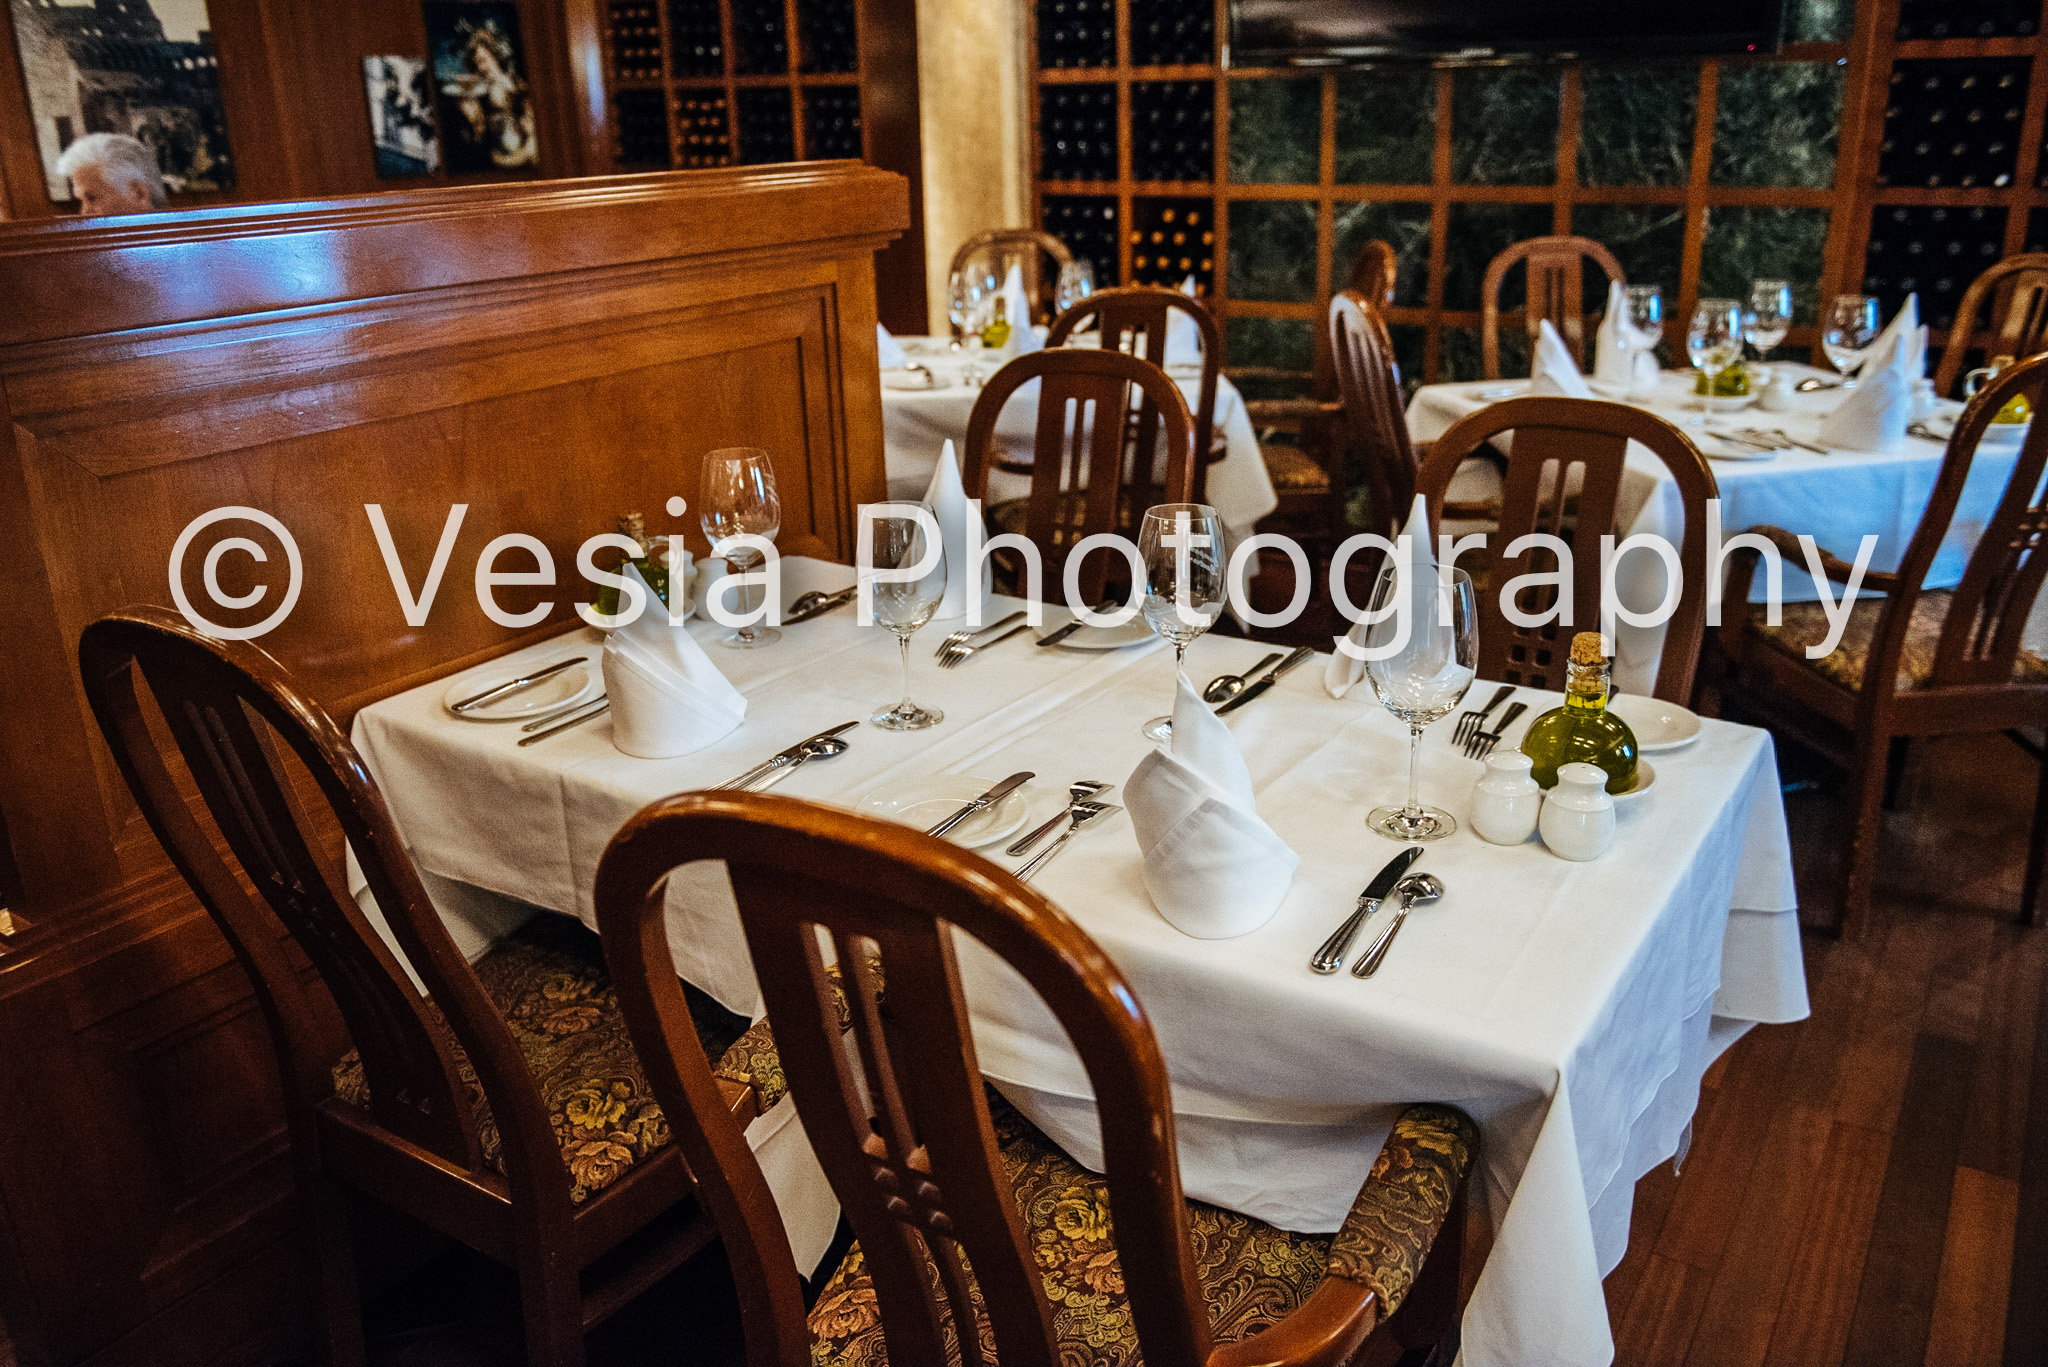 Campari_Centro_Food_Proofs-5.jpg